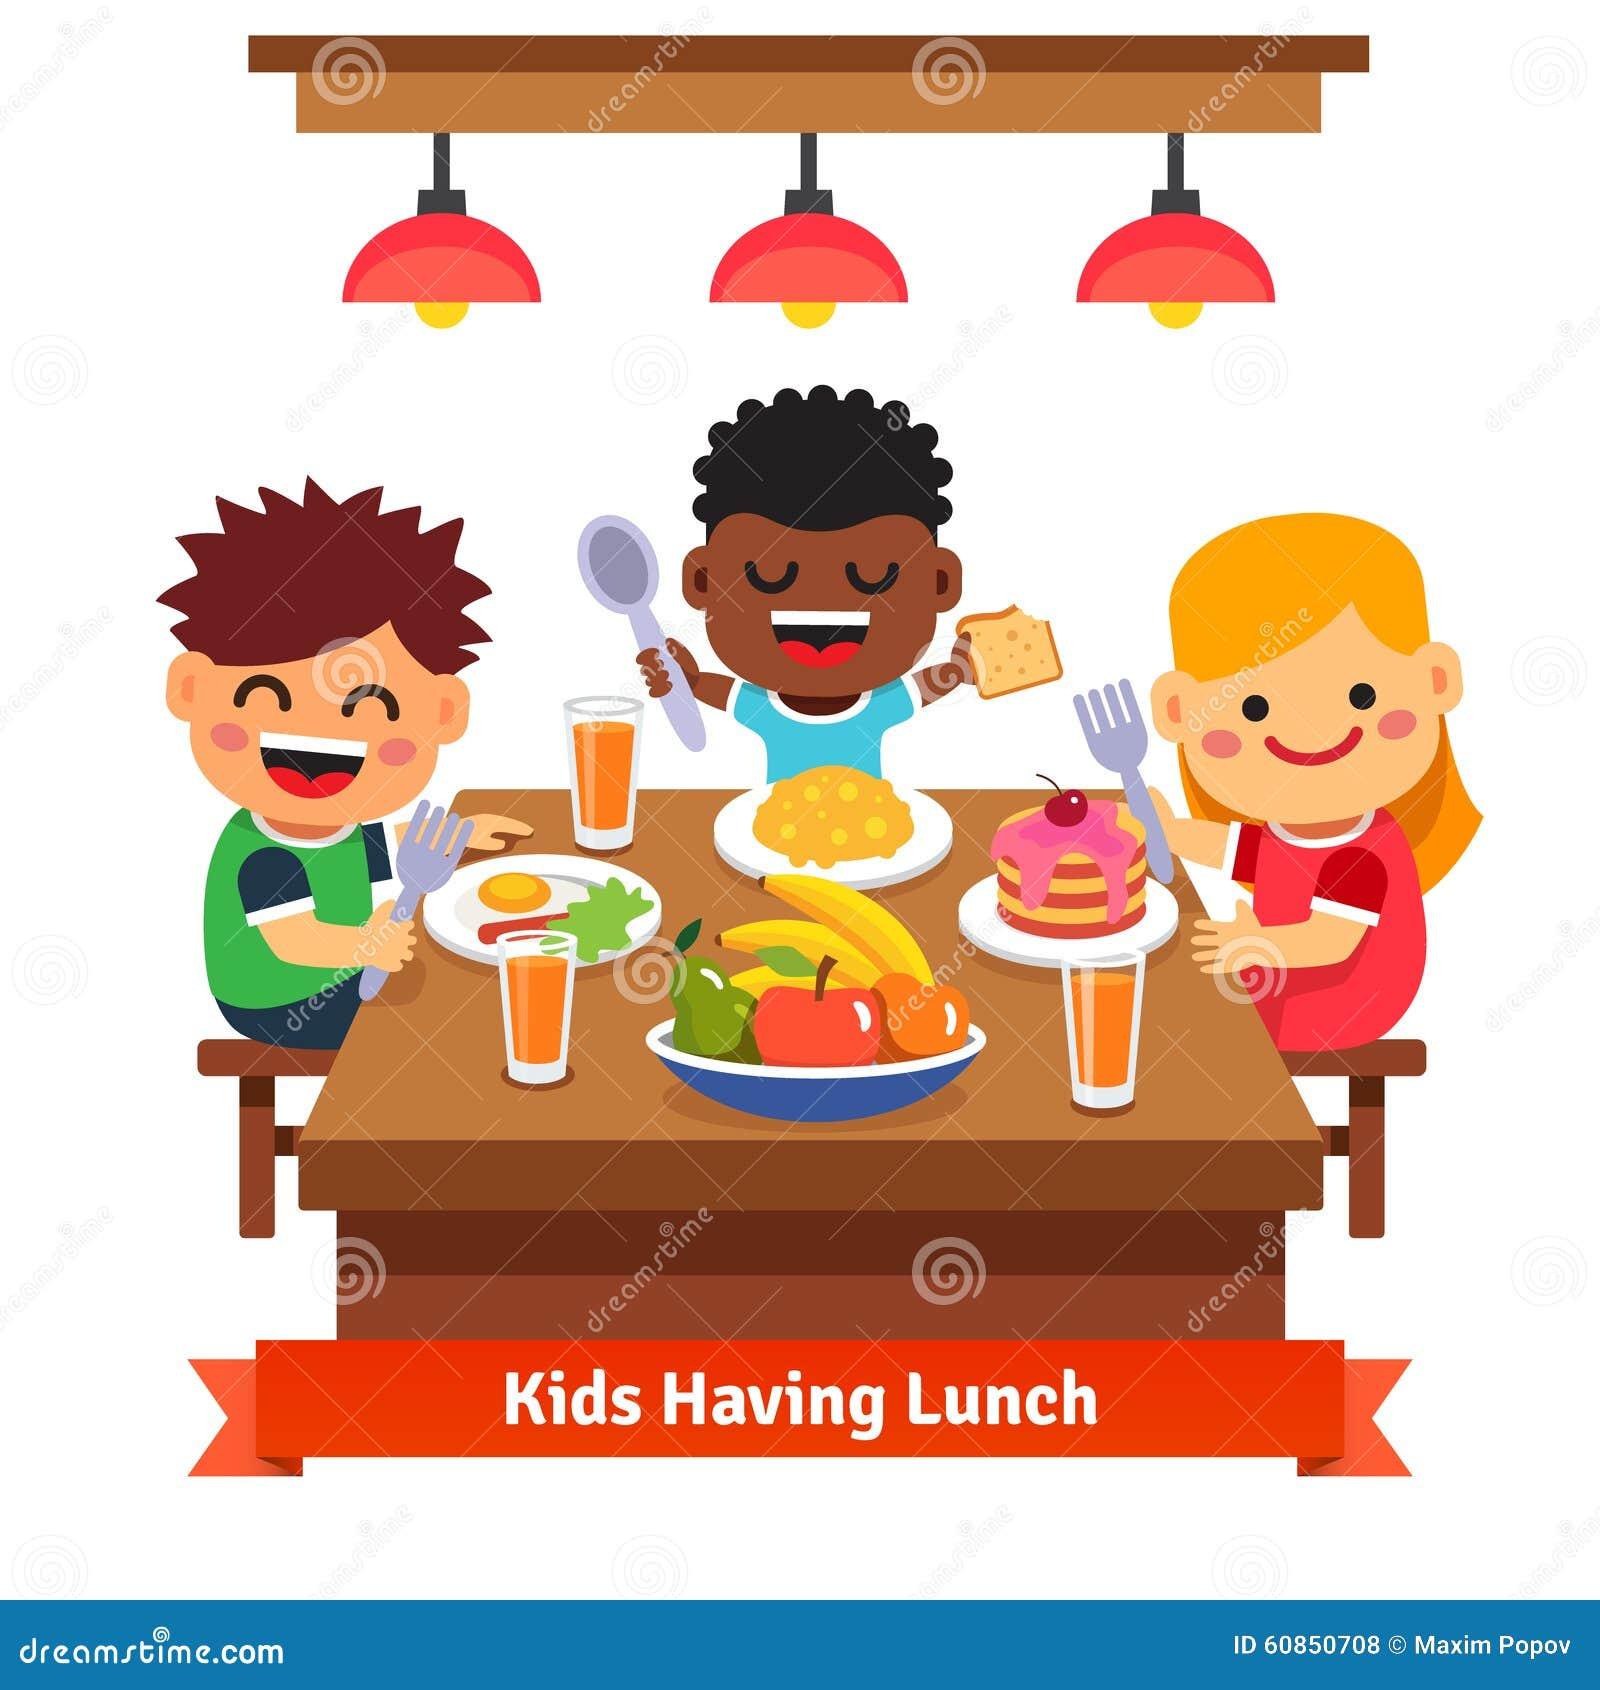 Children Having Dinner At The Kindergarten Of Home Stock  : children having dinner kindergarten home kids eating smiling flat style cartoon vector illustration white 60850708 from www.dreamstime.com size 1300 x 1390 jpeg 146kB